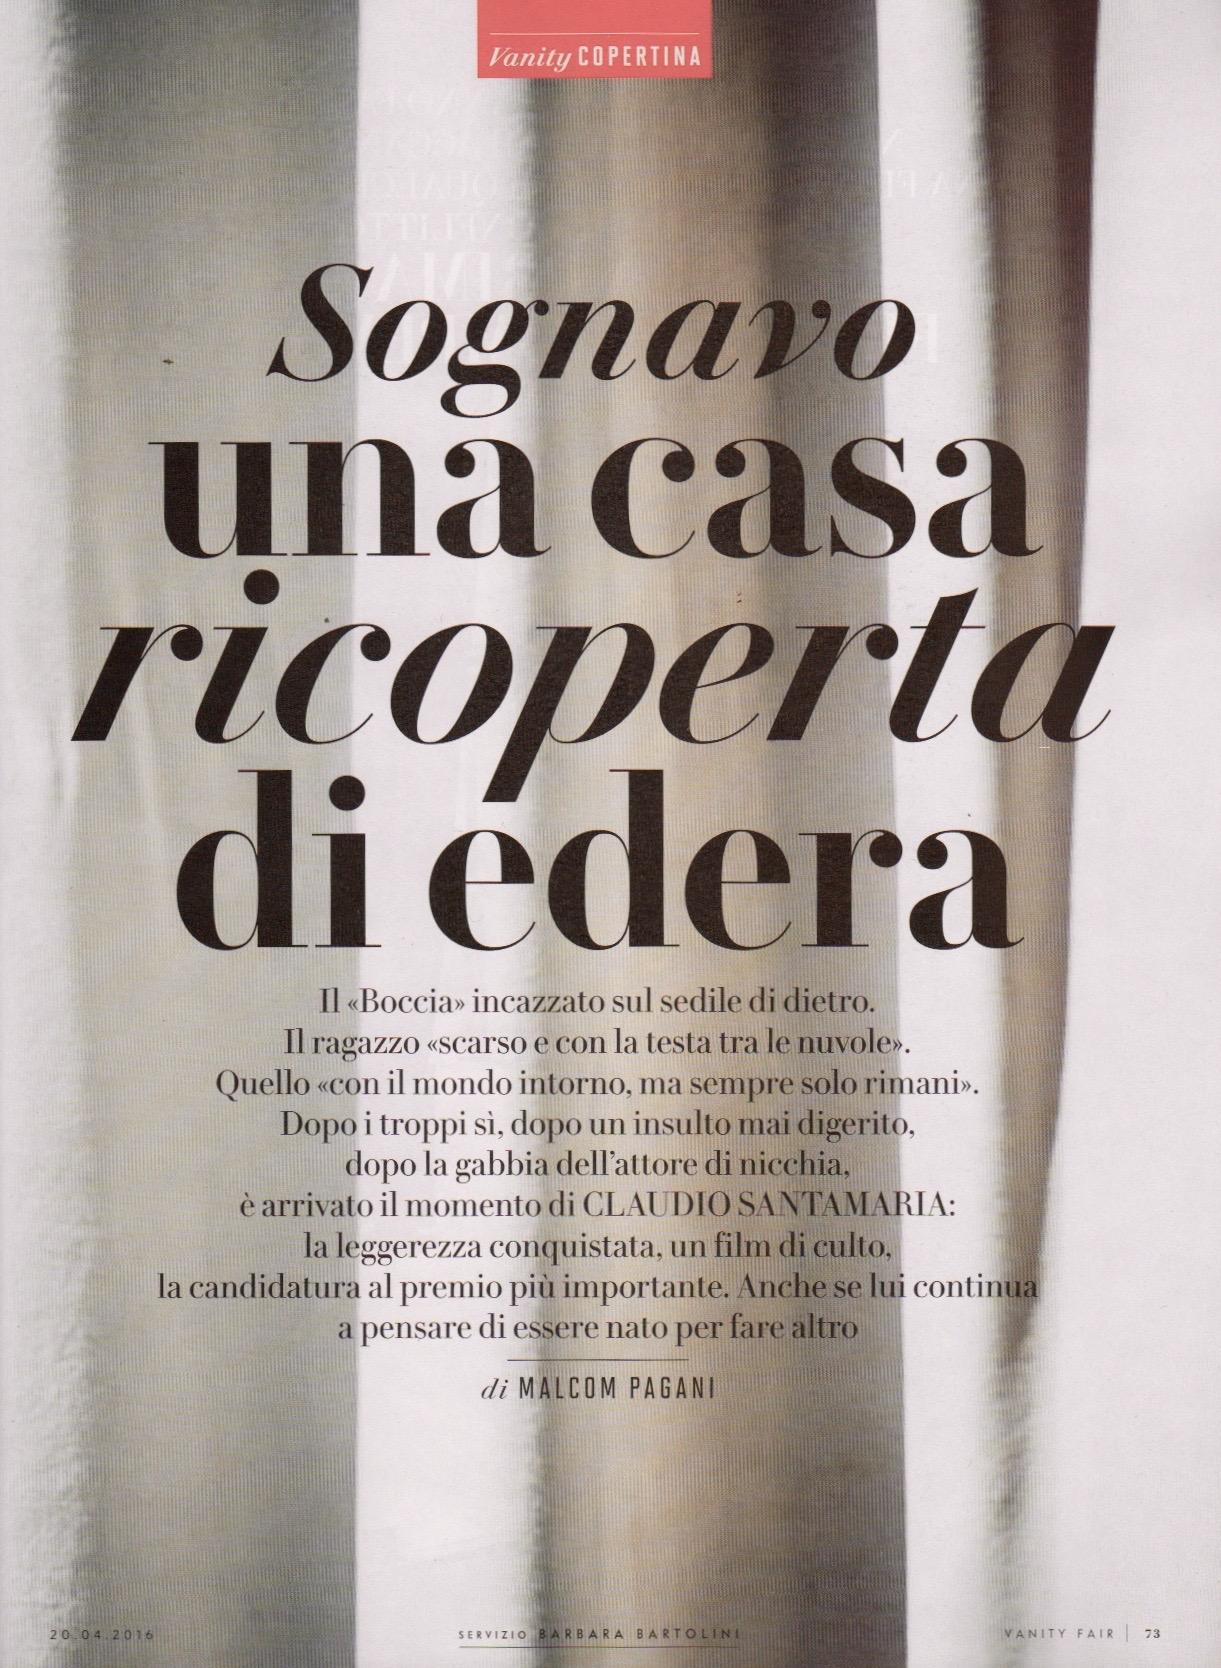 Vanity Fair- Santamaria - 13:4:2016 3